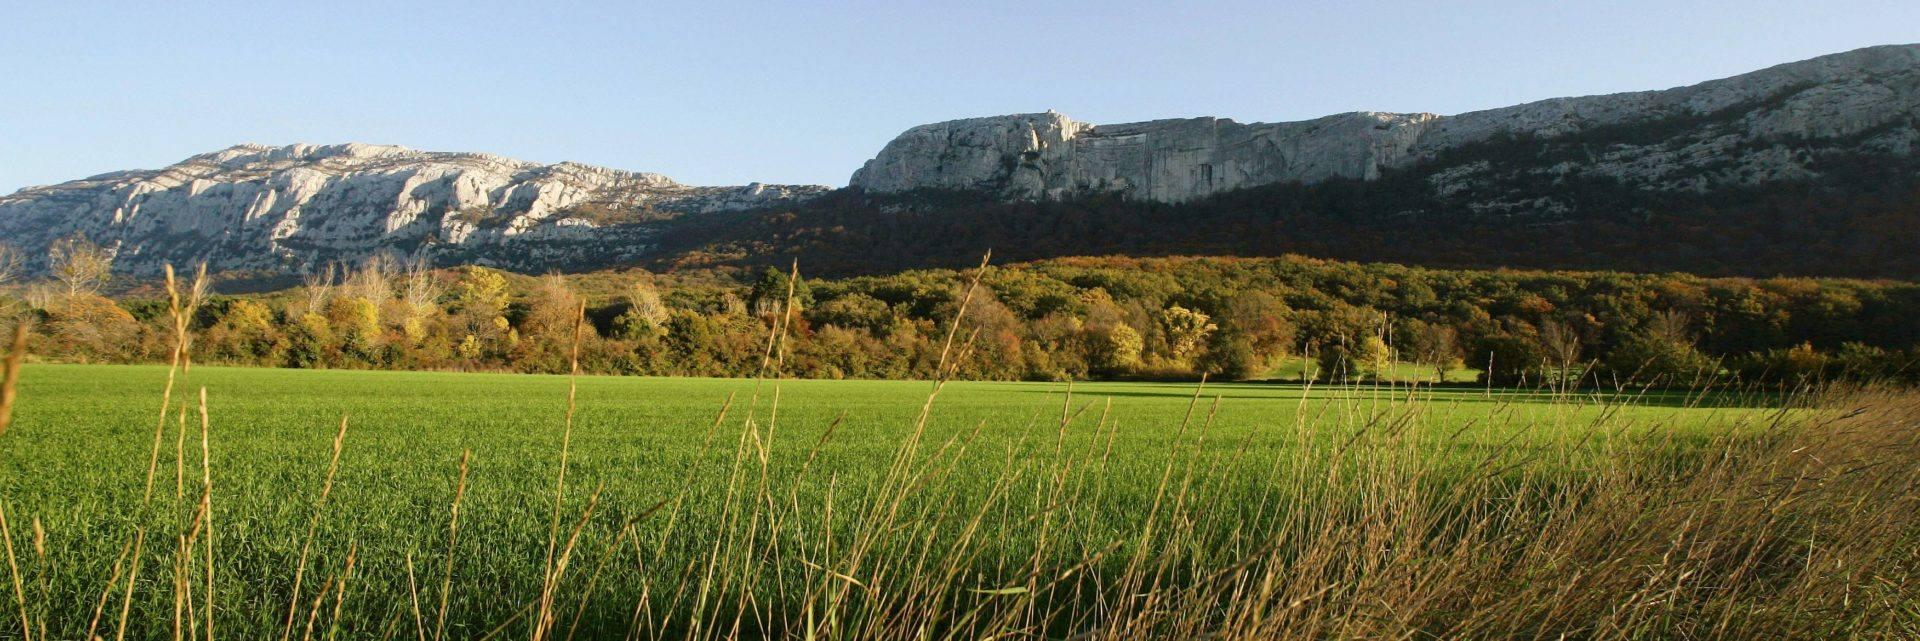 Randonnée massif de la Sainte Baume